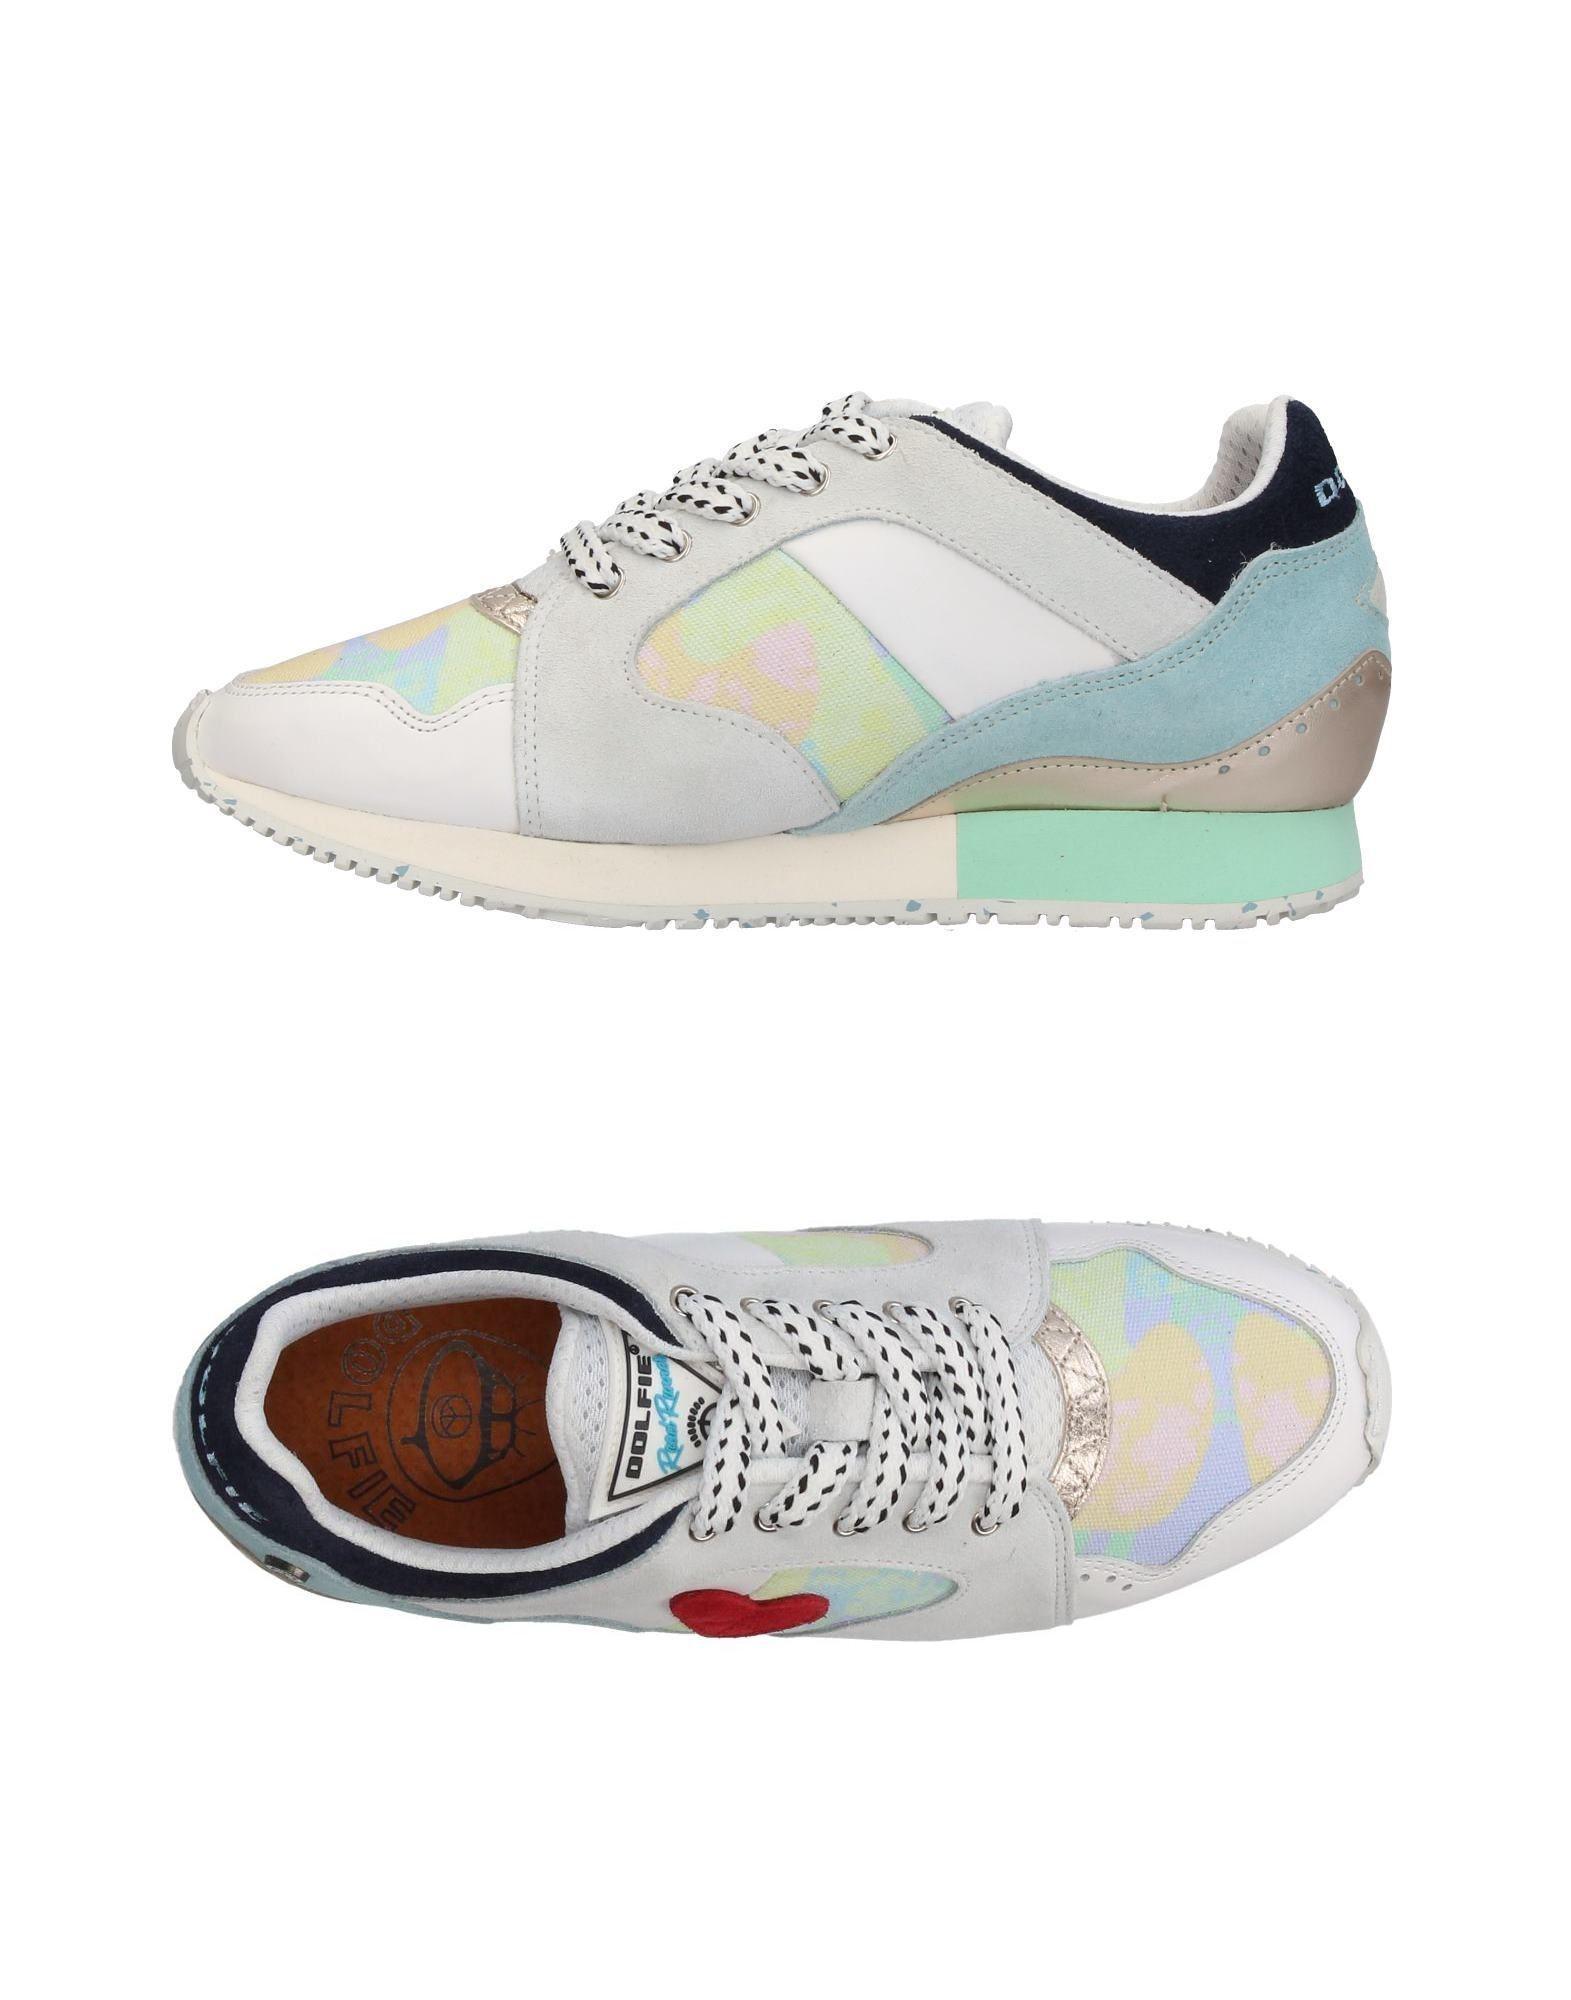 FOOTWEAR - Low-tops & sneakers Dolfie Looking For For Sale Cheap Price Pre Order jCSi7aLq2T